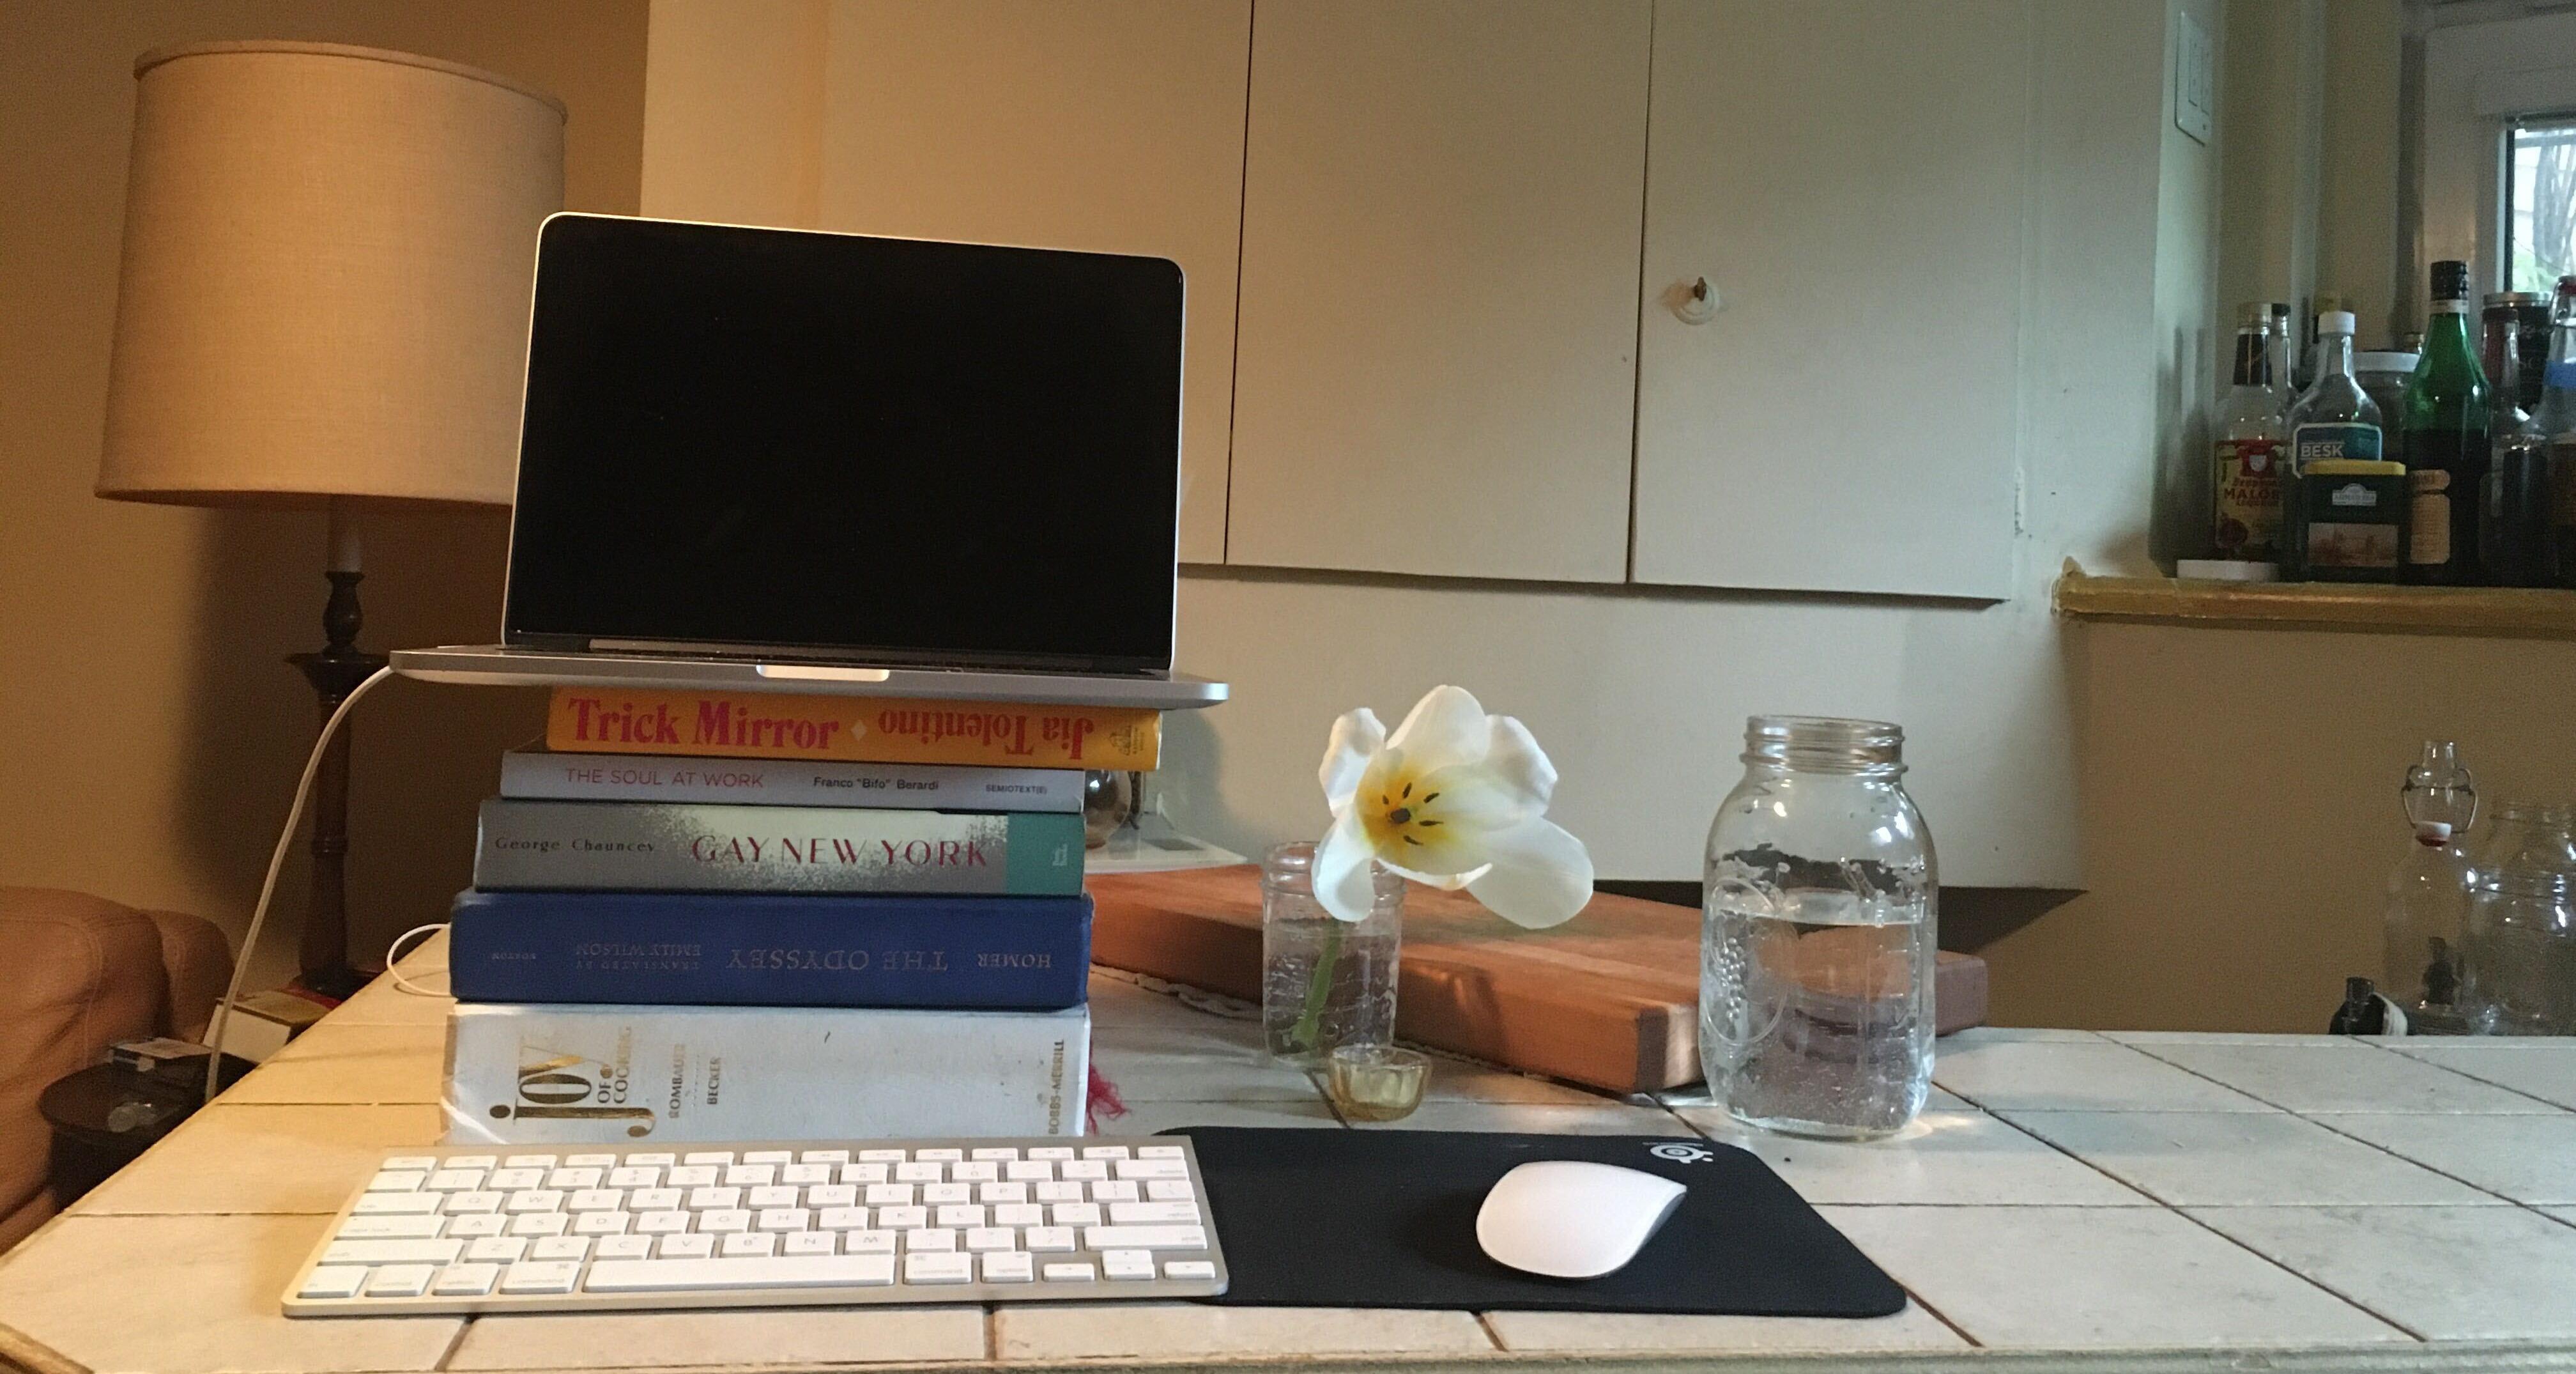 How We Work Virtually: Nina Berman